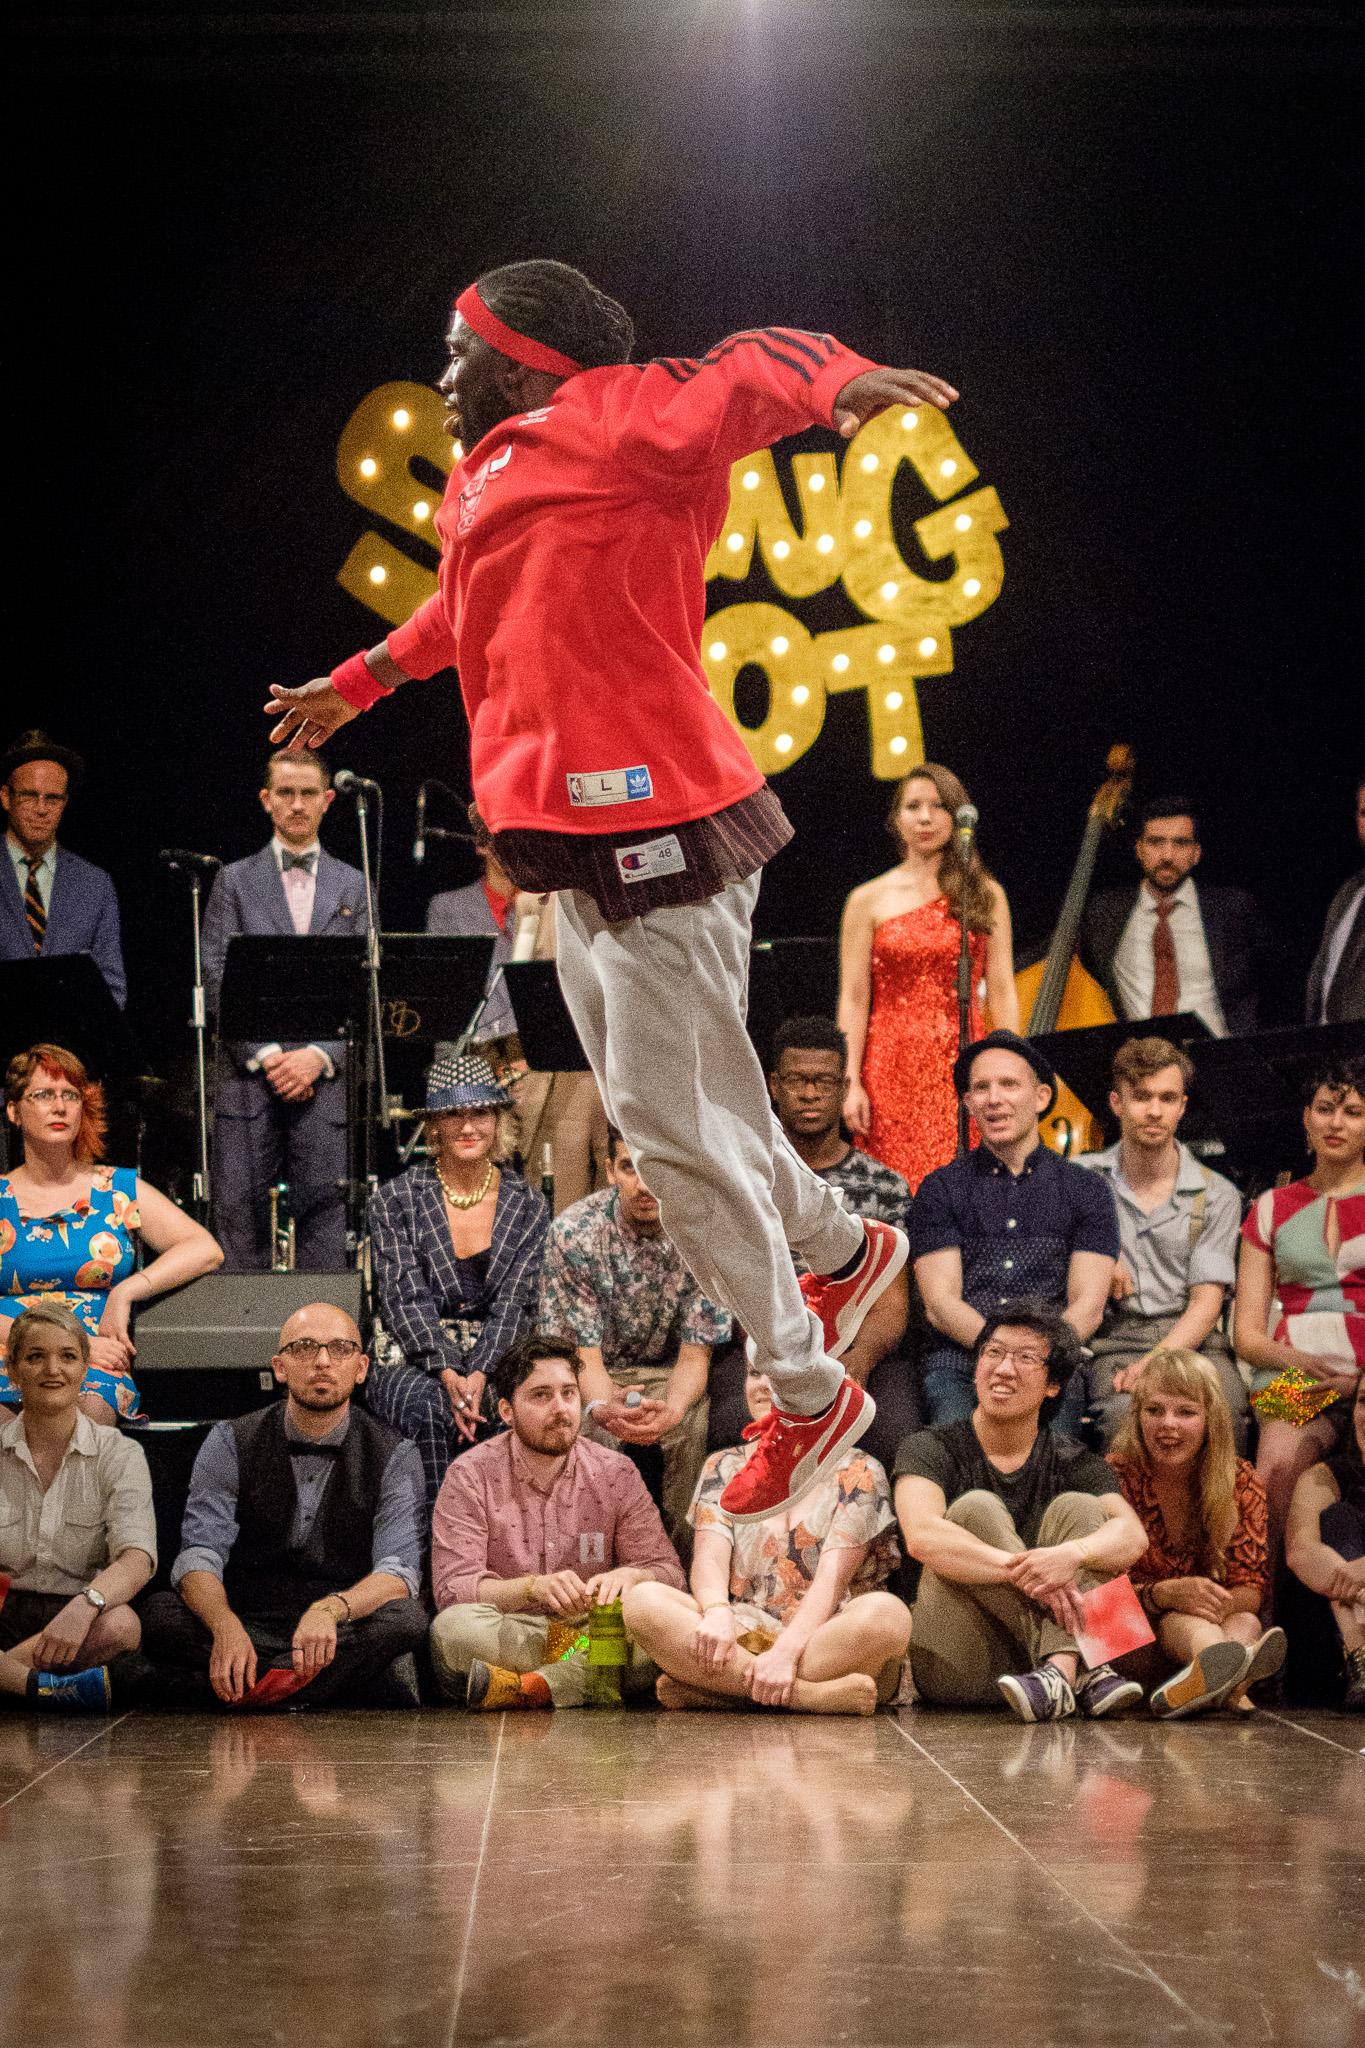 montreal-swing-riot-2011407.jpg